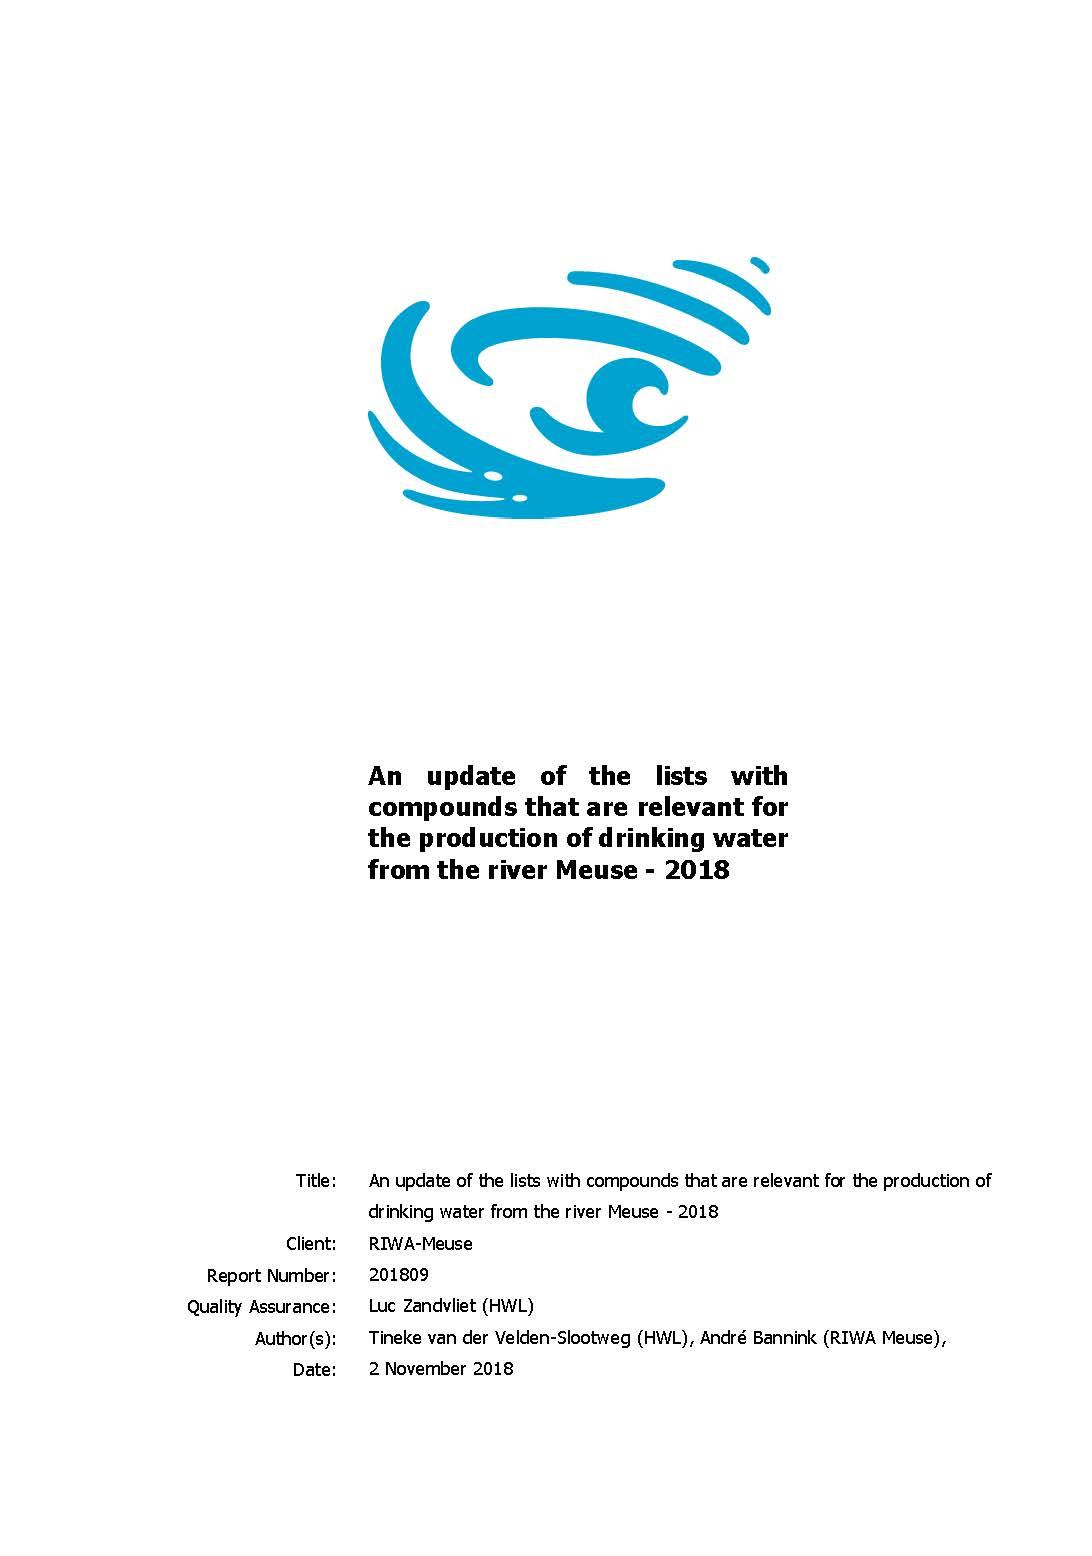 RIWA-Maas – RIWA-Maas is een internationaal samenwerkingsverband van